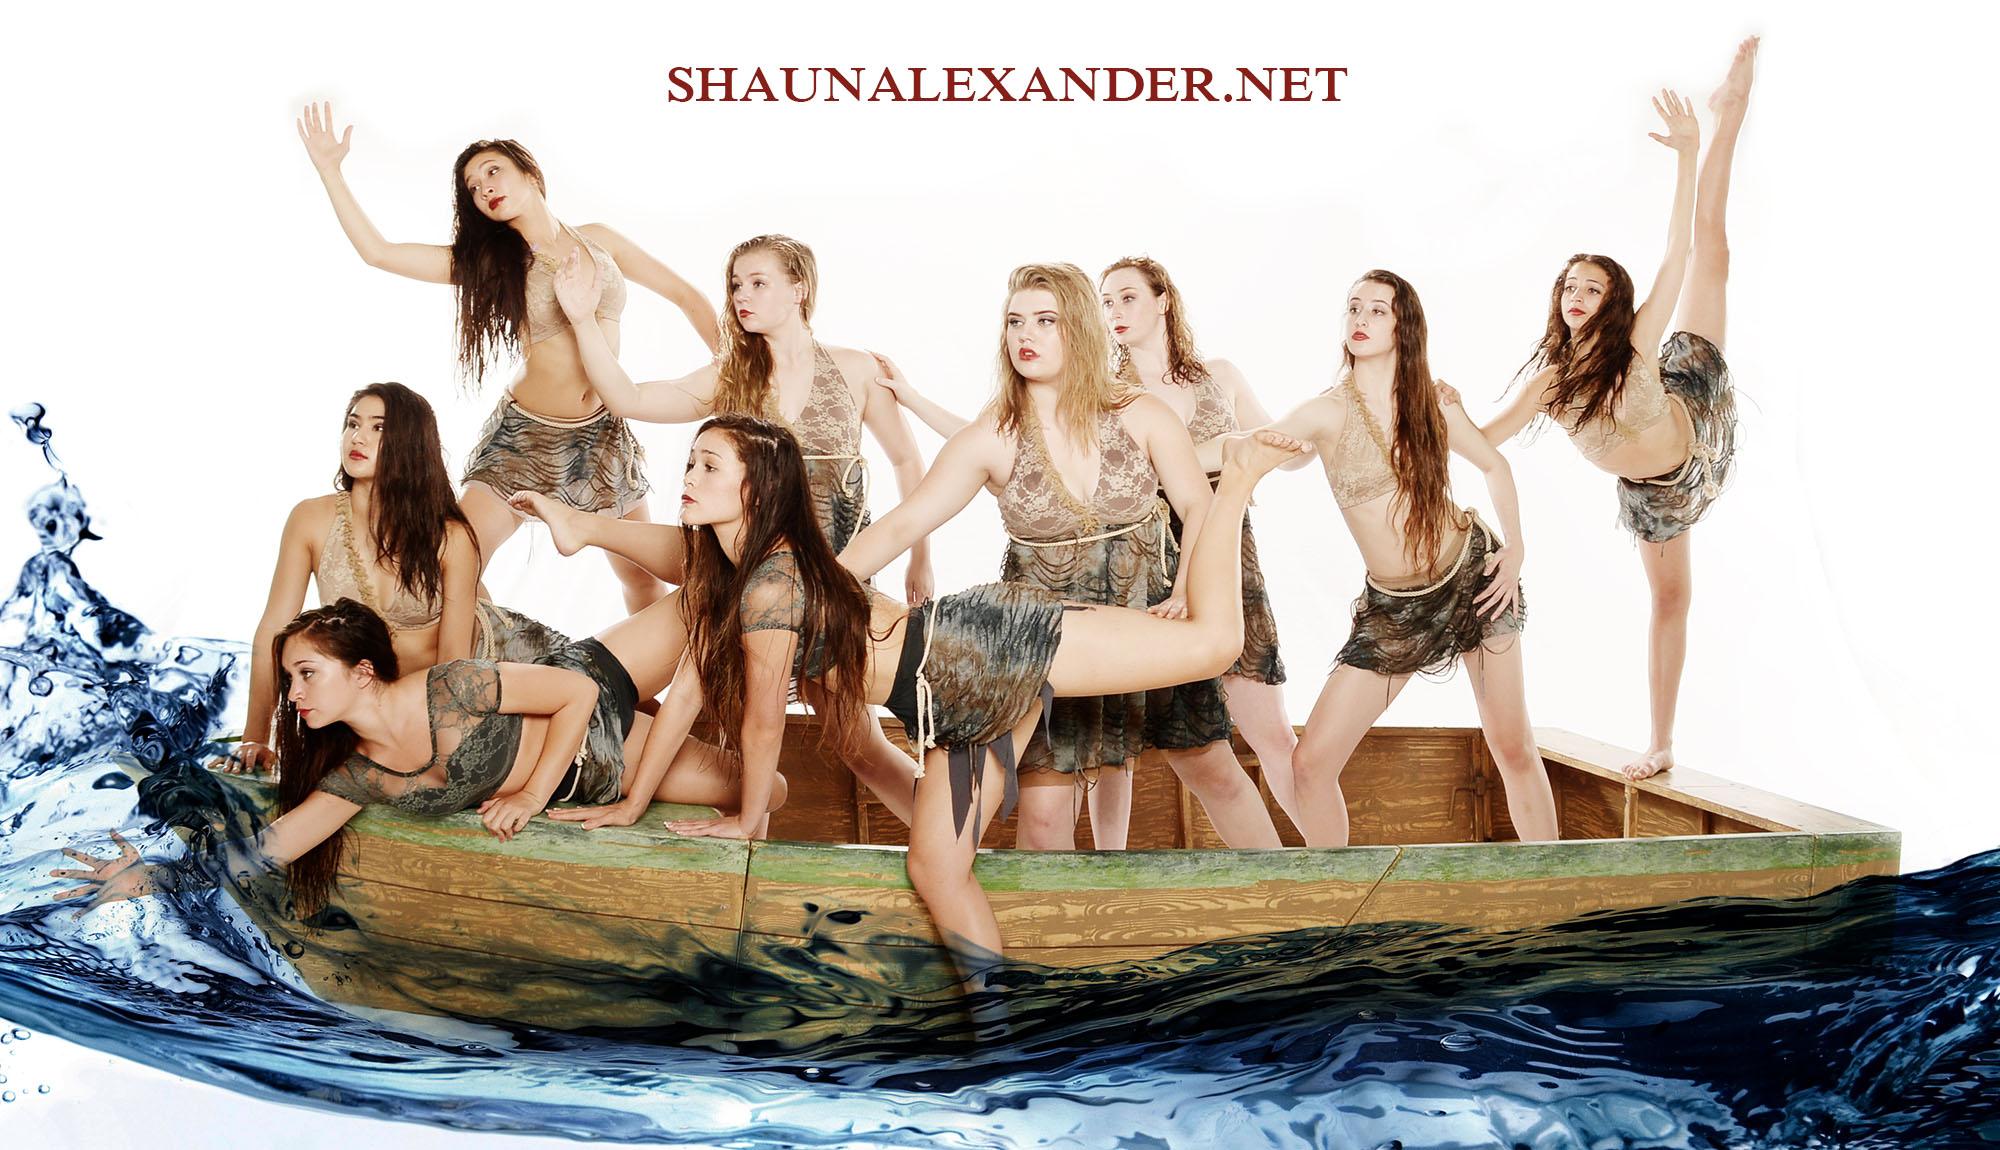 professional dancers group photos by Shaun Alexander